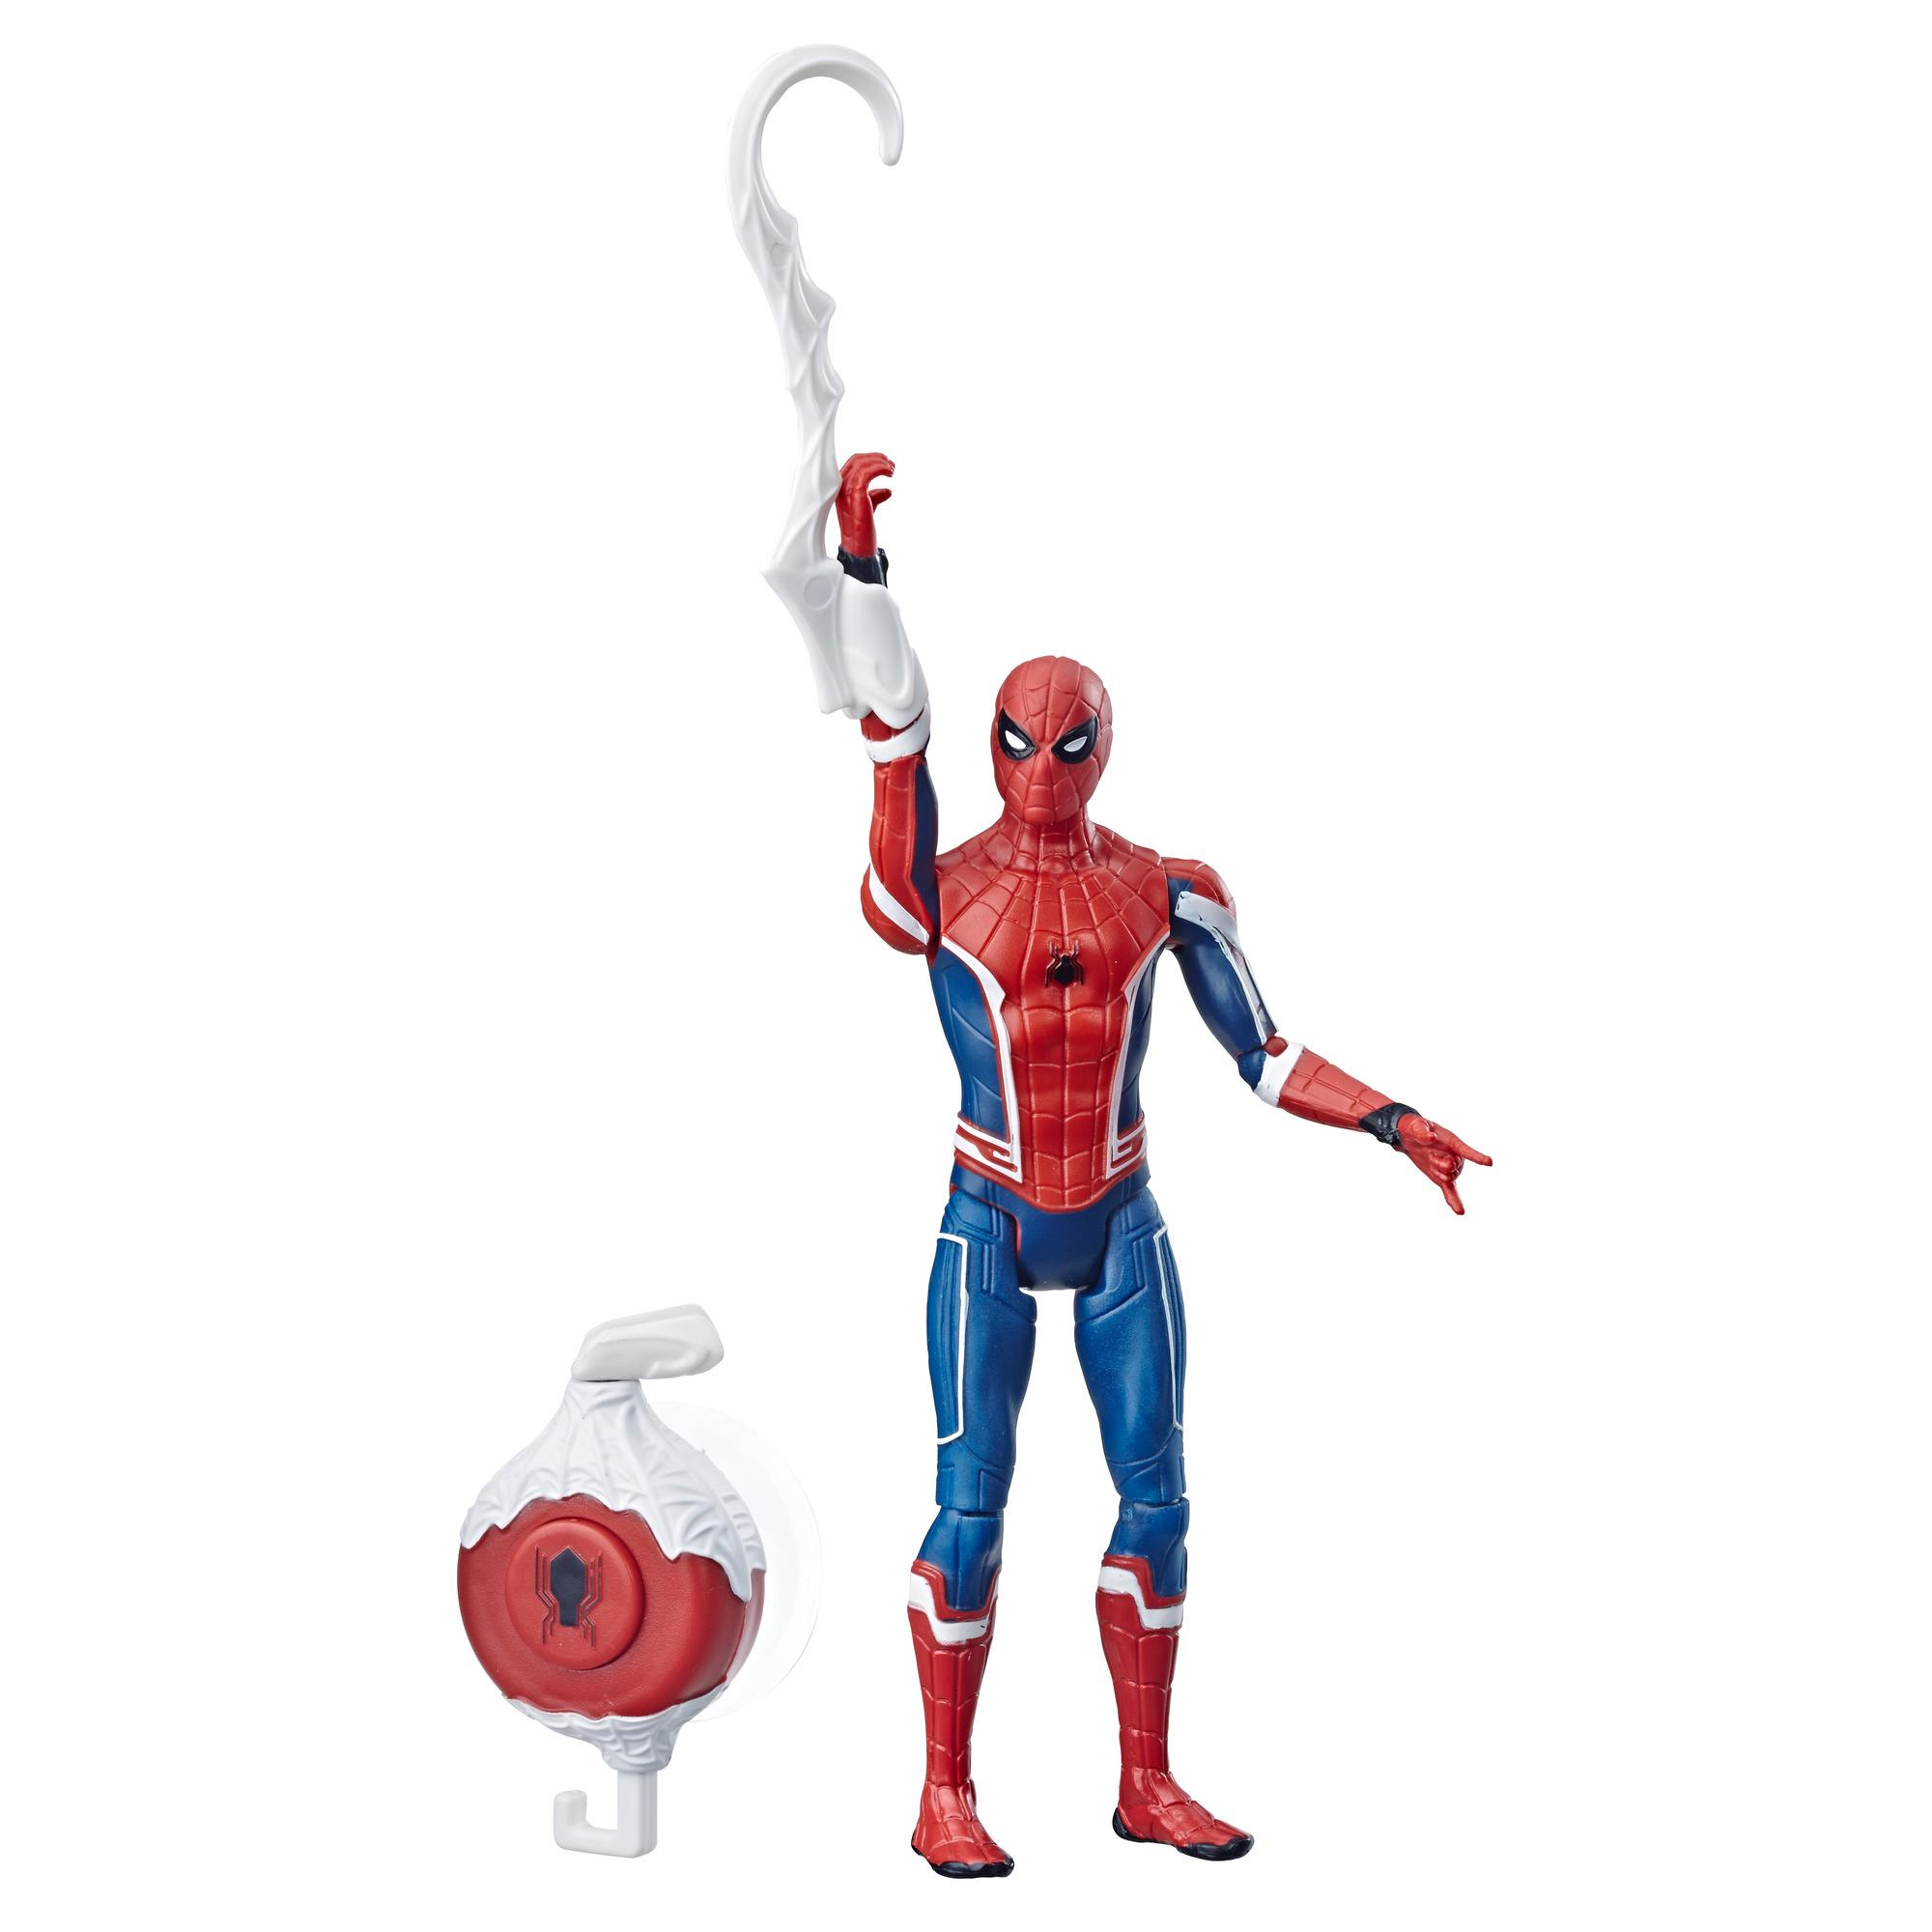 Spider-Man Far from Home  Spider-Man